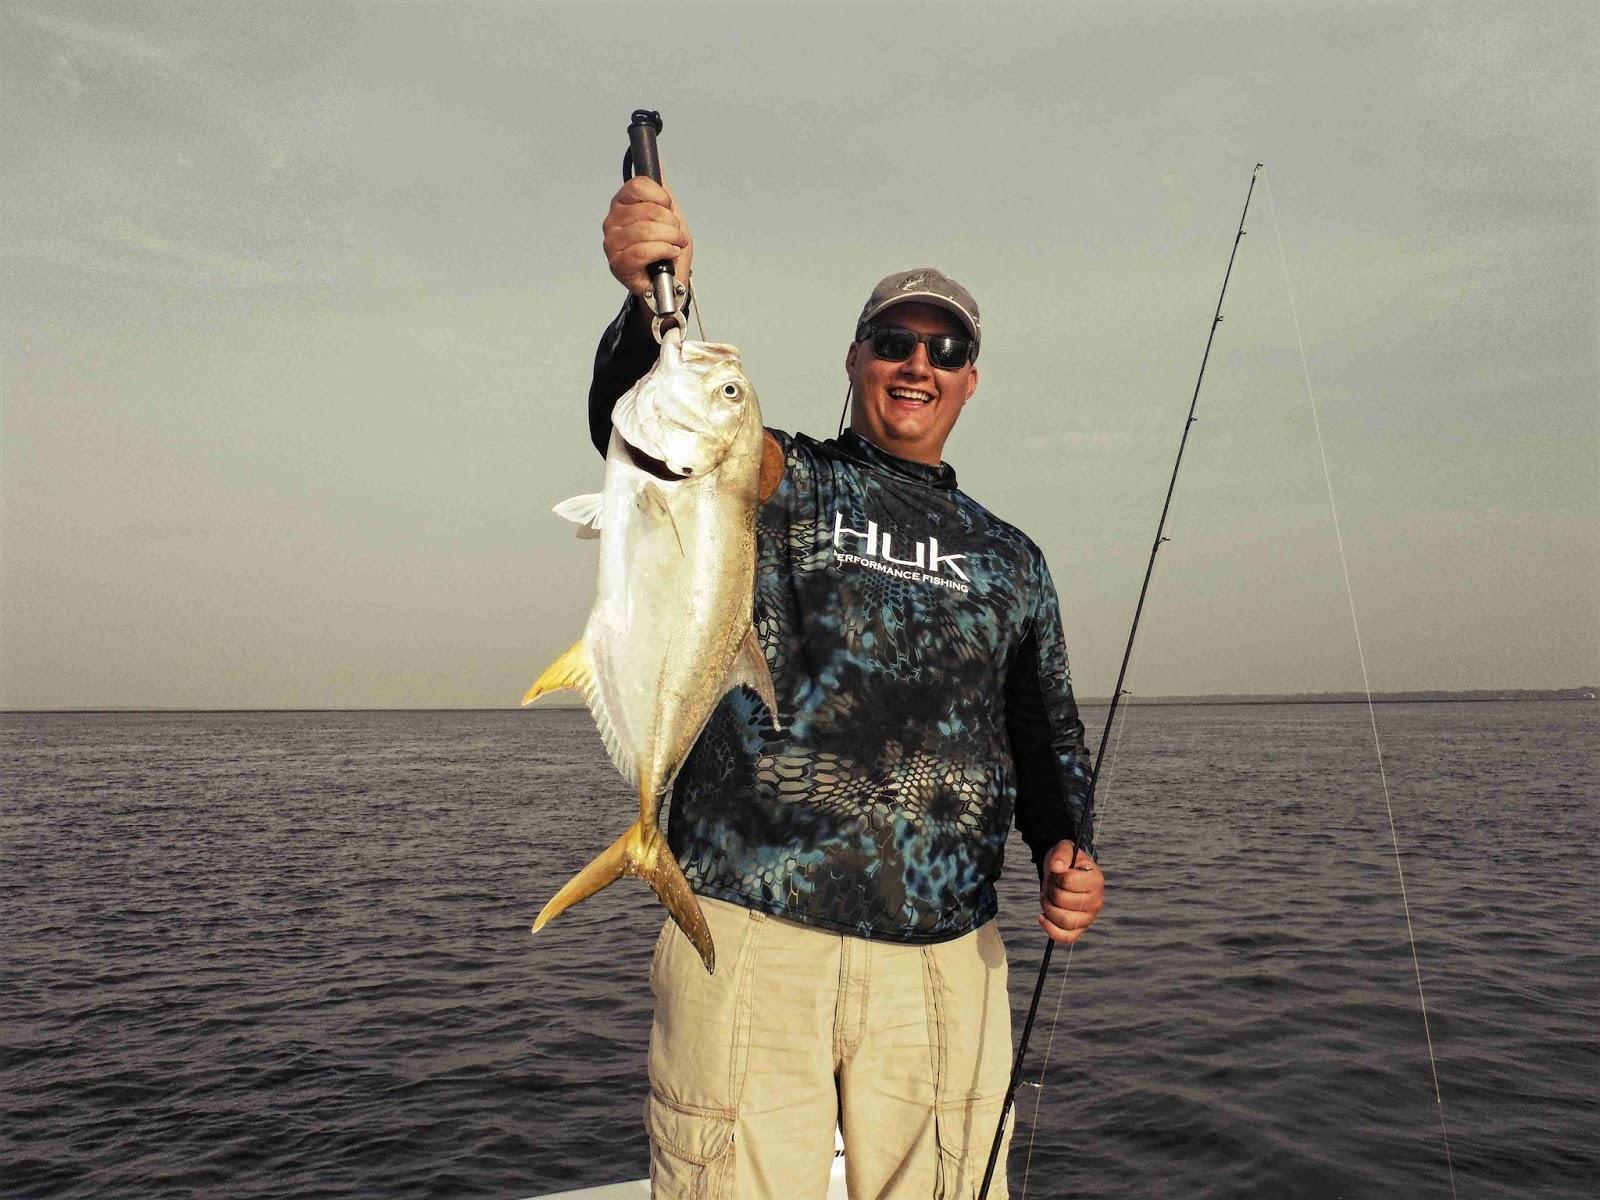 Amelia island fishing reports mangrove bonanza at amelia for Amelia island fishing